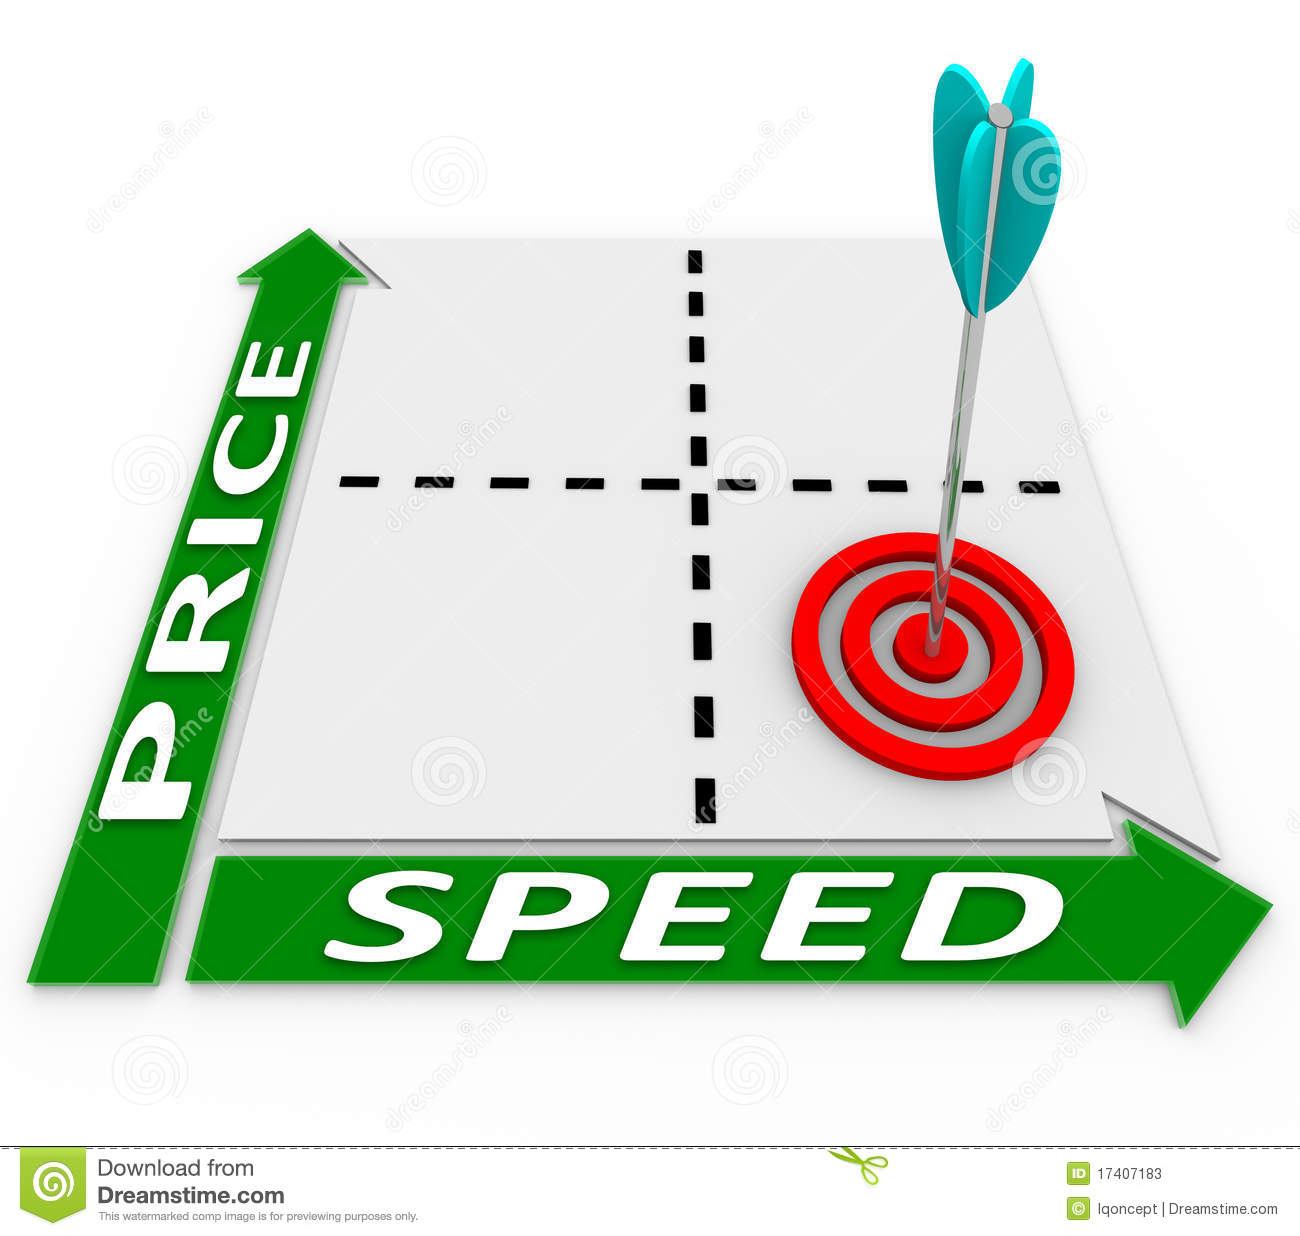 Speed arrow clipart png Price Speed Matrix - Arrow And Target Stock Photos - Image: 17407183 png